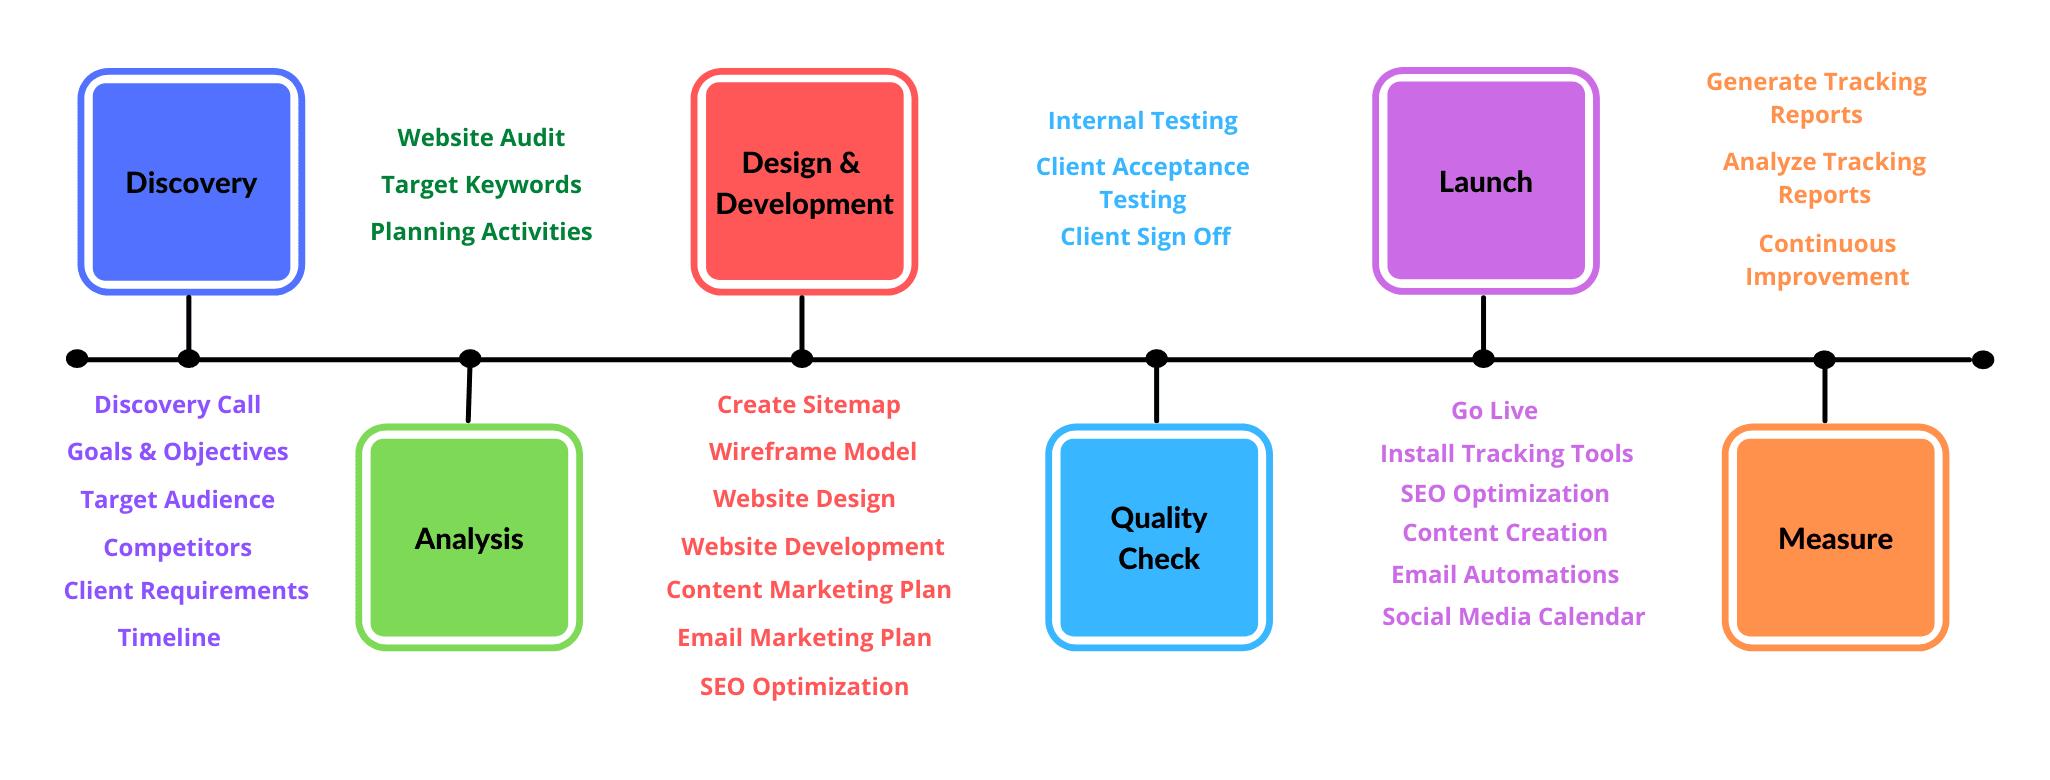 Web Design Step by Step Process